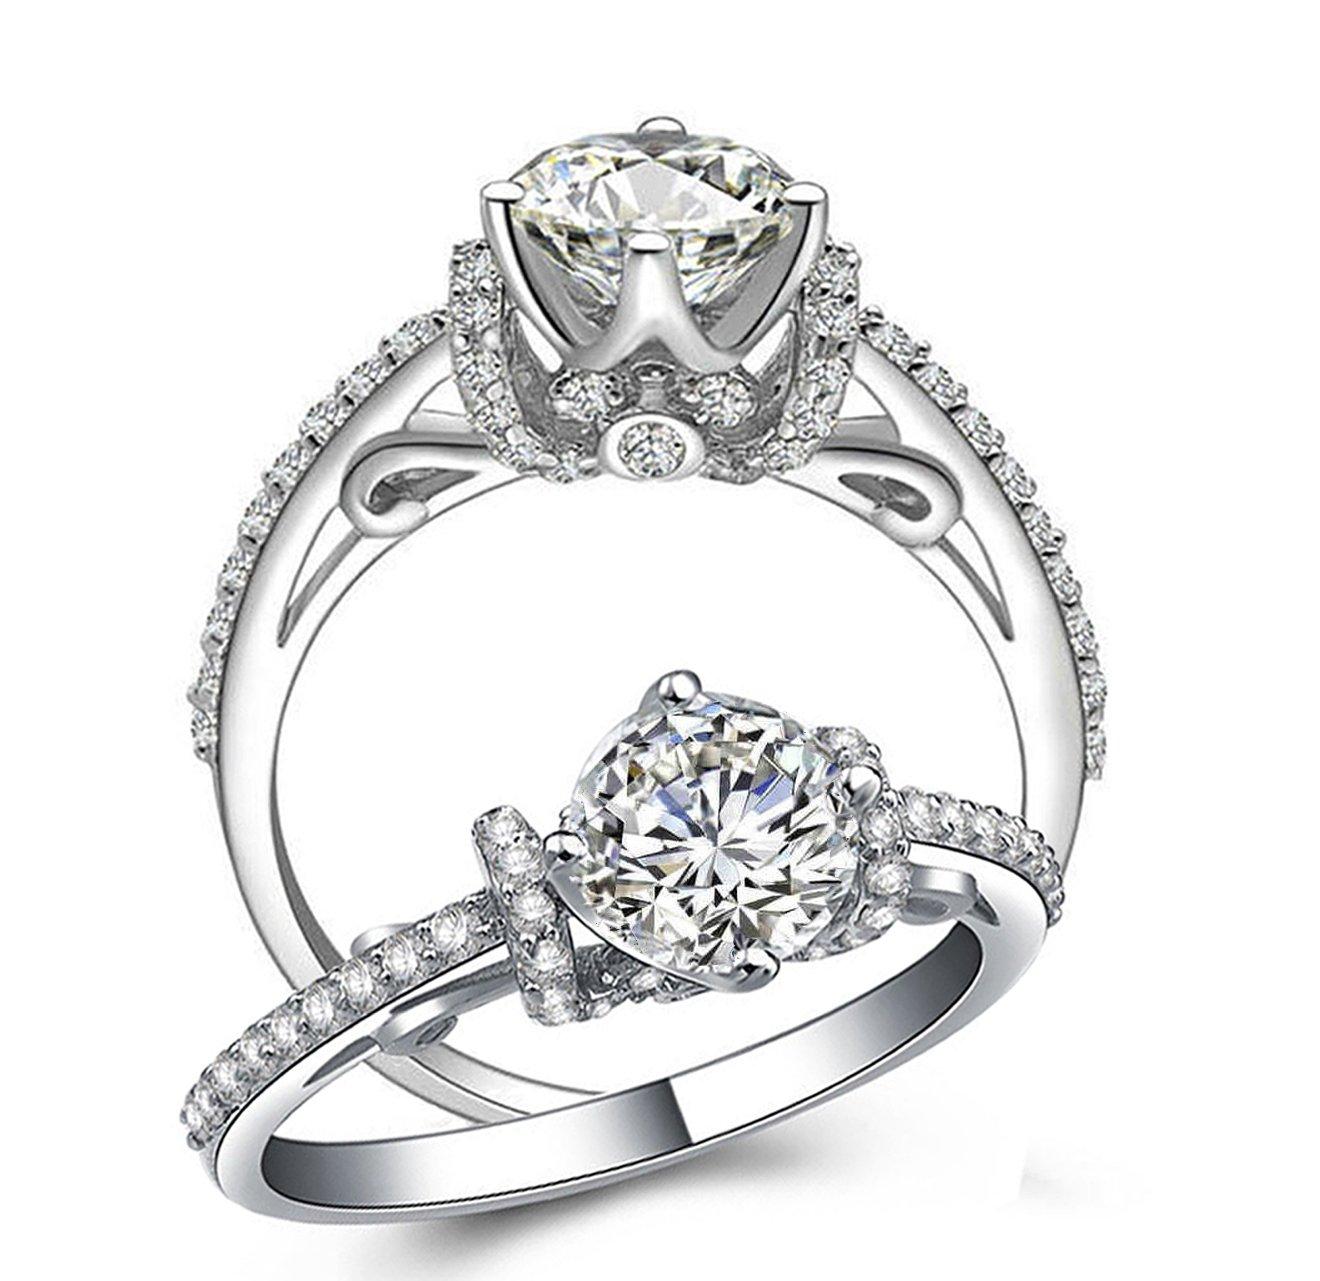 SCALOP8 SOLID 925 SILVER TOP QUALITY 1 CARAT DESIGNER ART DECOR SIMULATED DIAMOND RING HEARTS ARROWS CUT